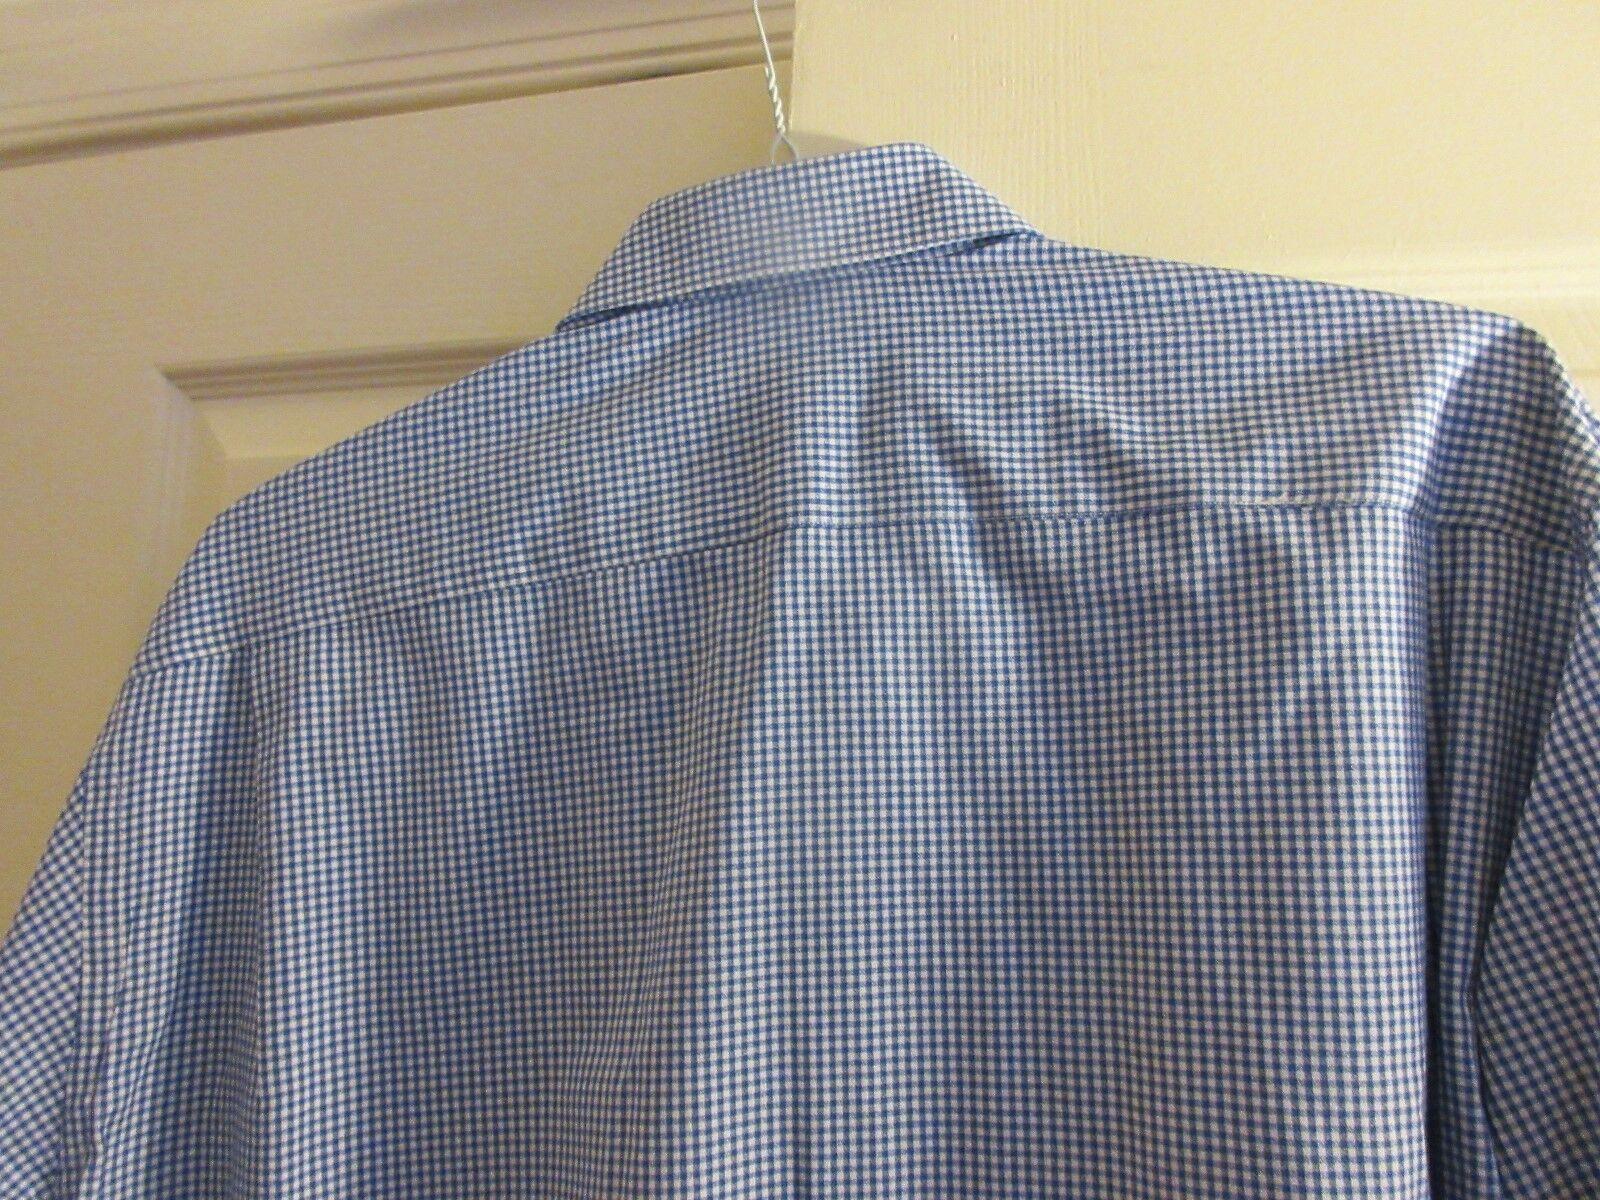 St. Croix , Men's Long Sleeve Shirt , Size XL 17/17.5 ,